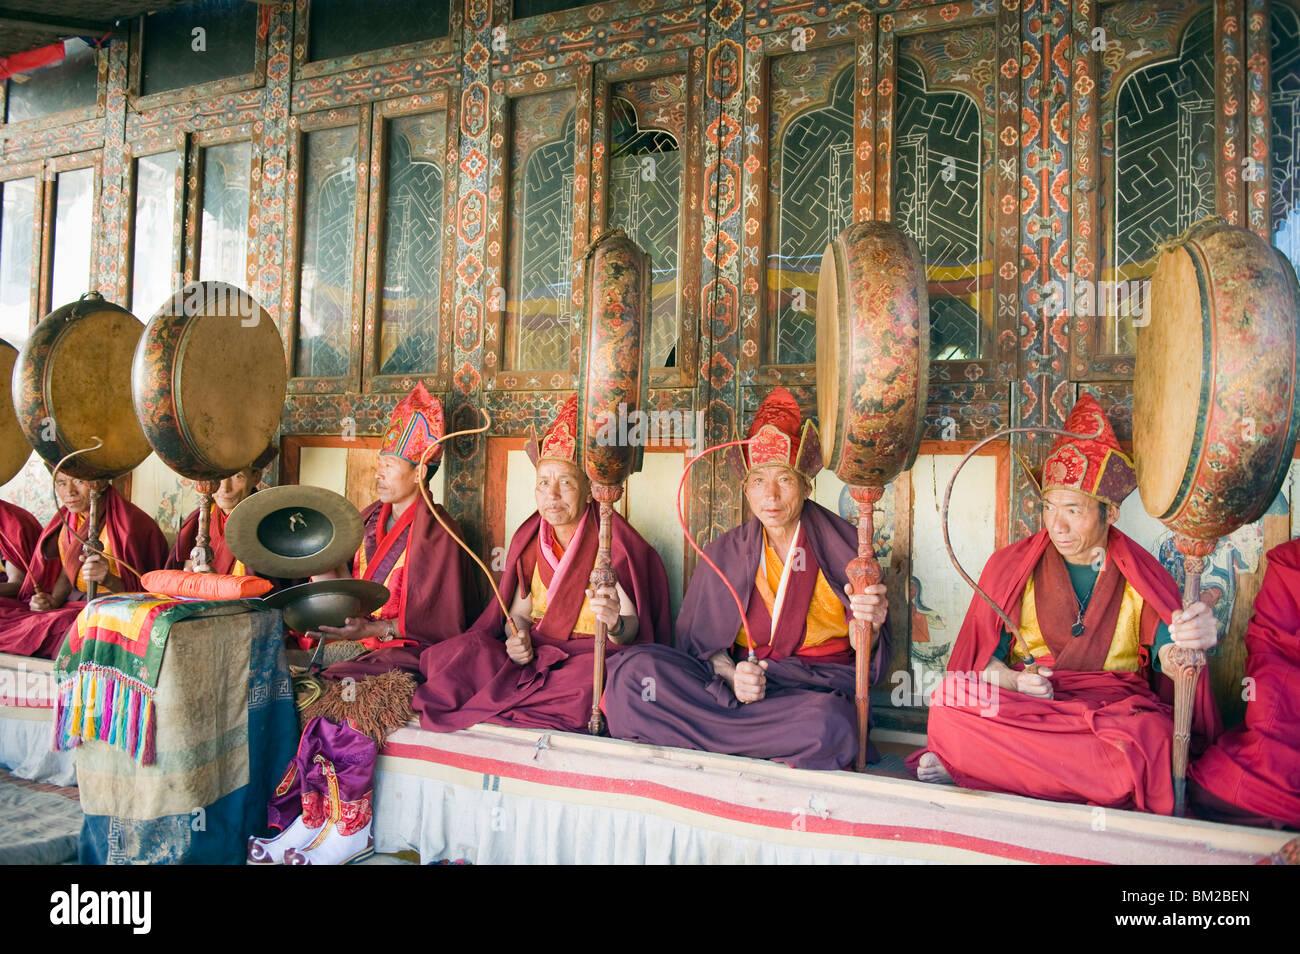 Monks playing drums at a Tsechu (festiva), Gangtey Gompa (Monastery), Phobjikha Valley, Bhutan - Stock Image